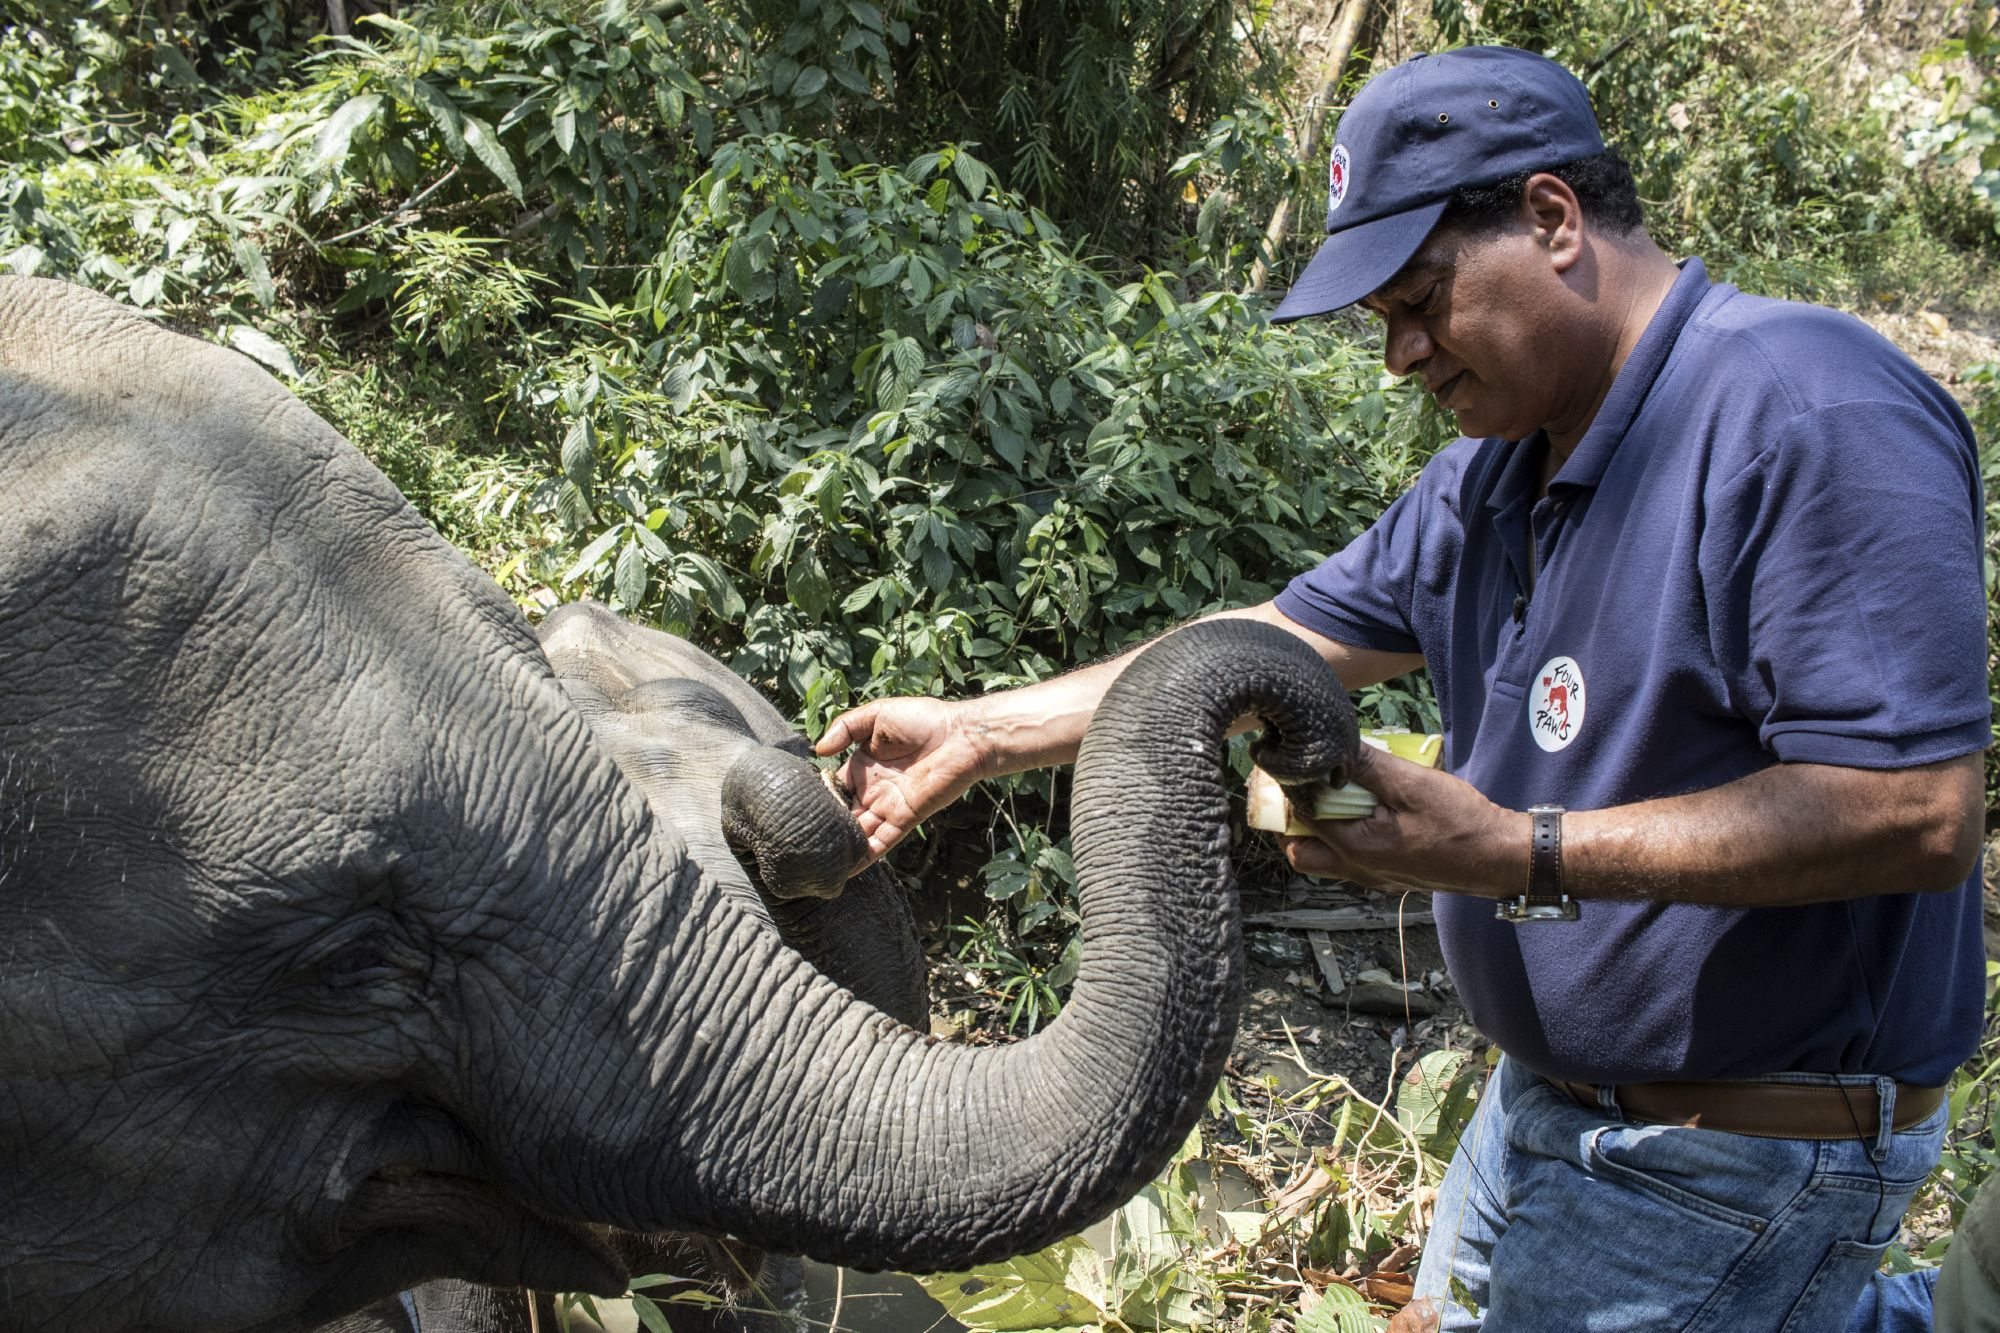 VIER PFOTEN hilft Elefanten in Not